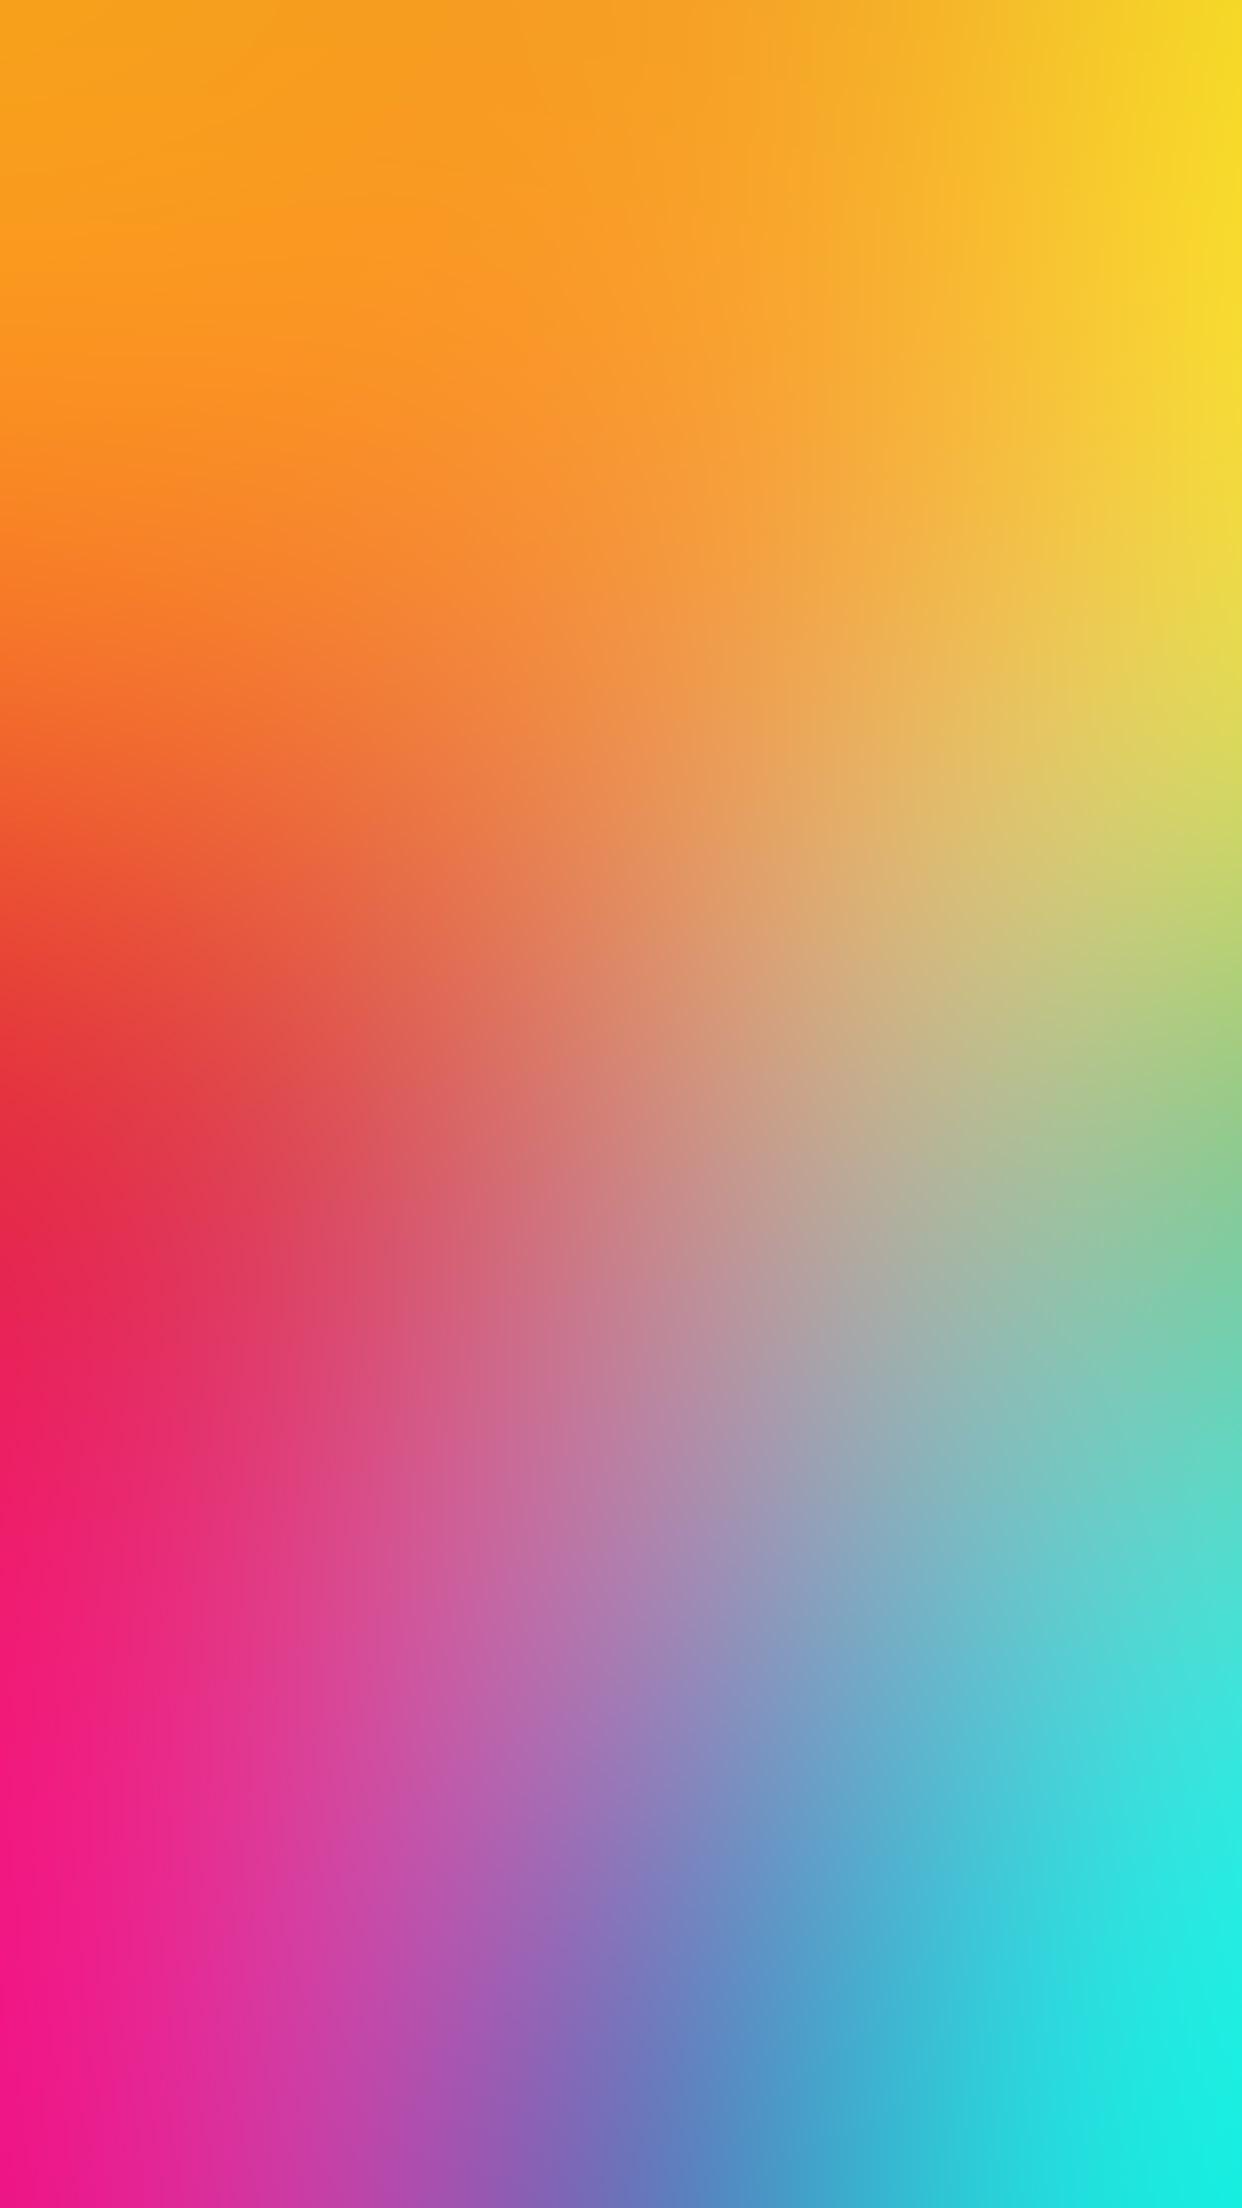 Iphone se - Color gradation wallpaper ...